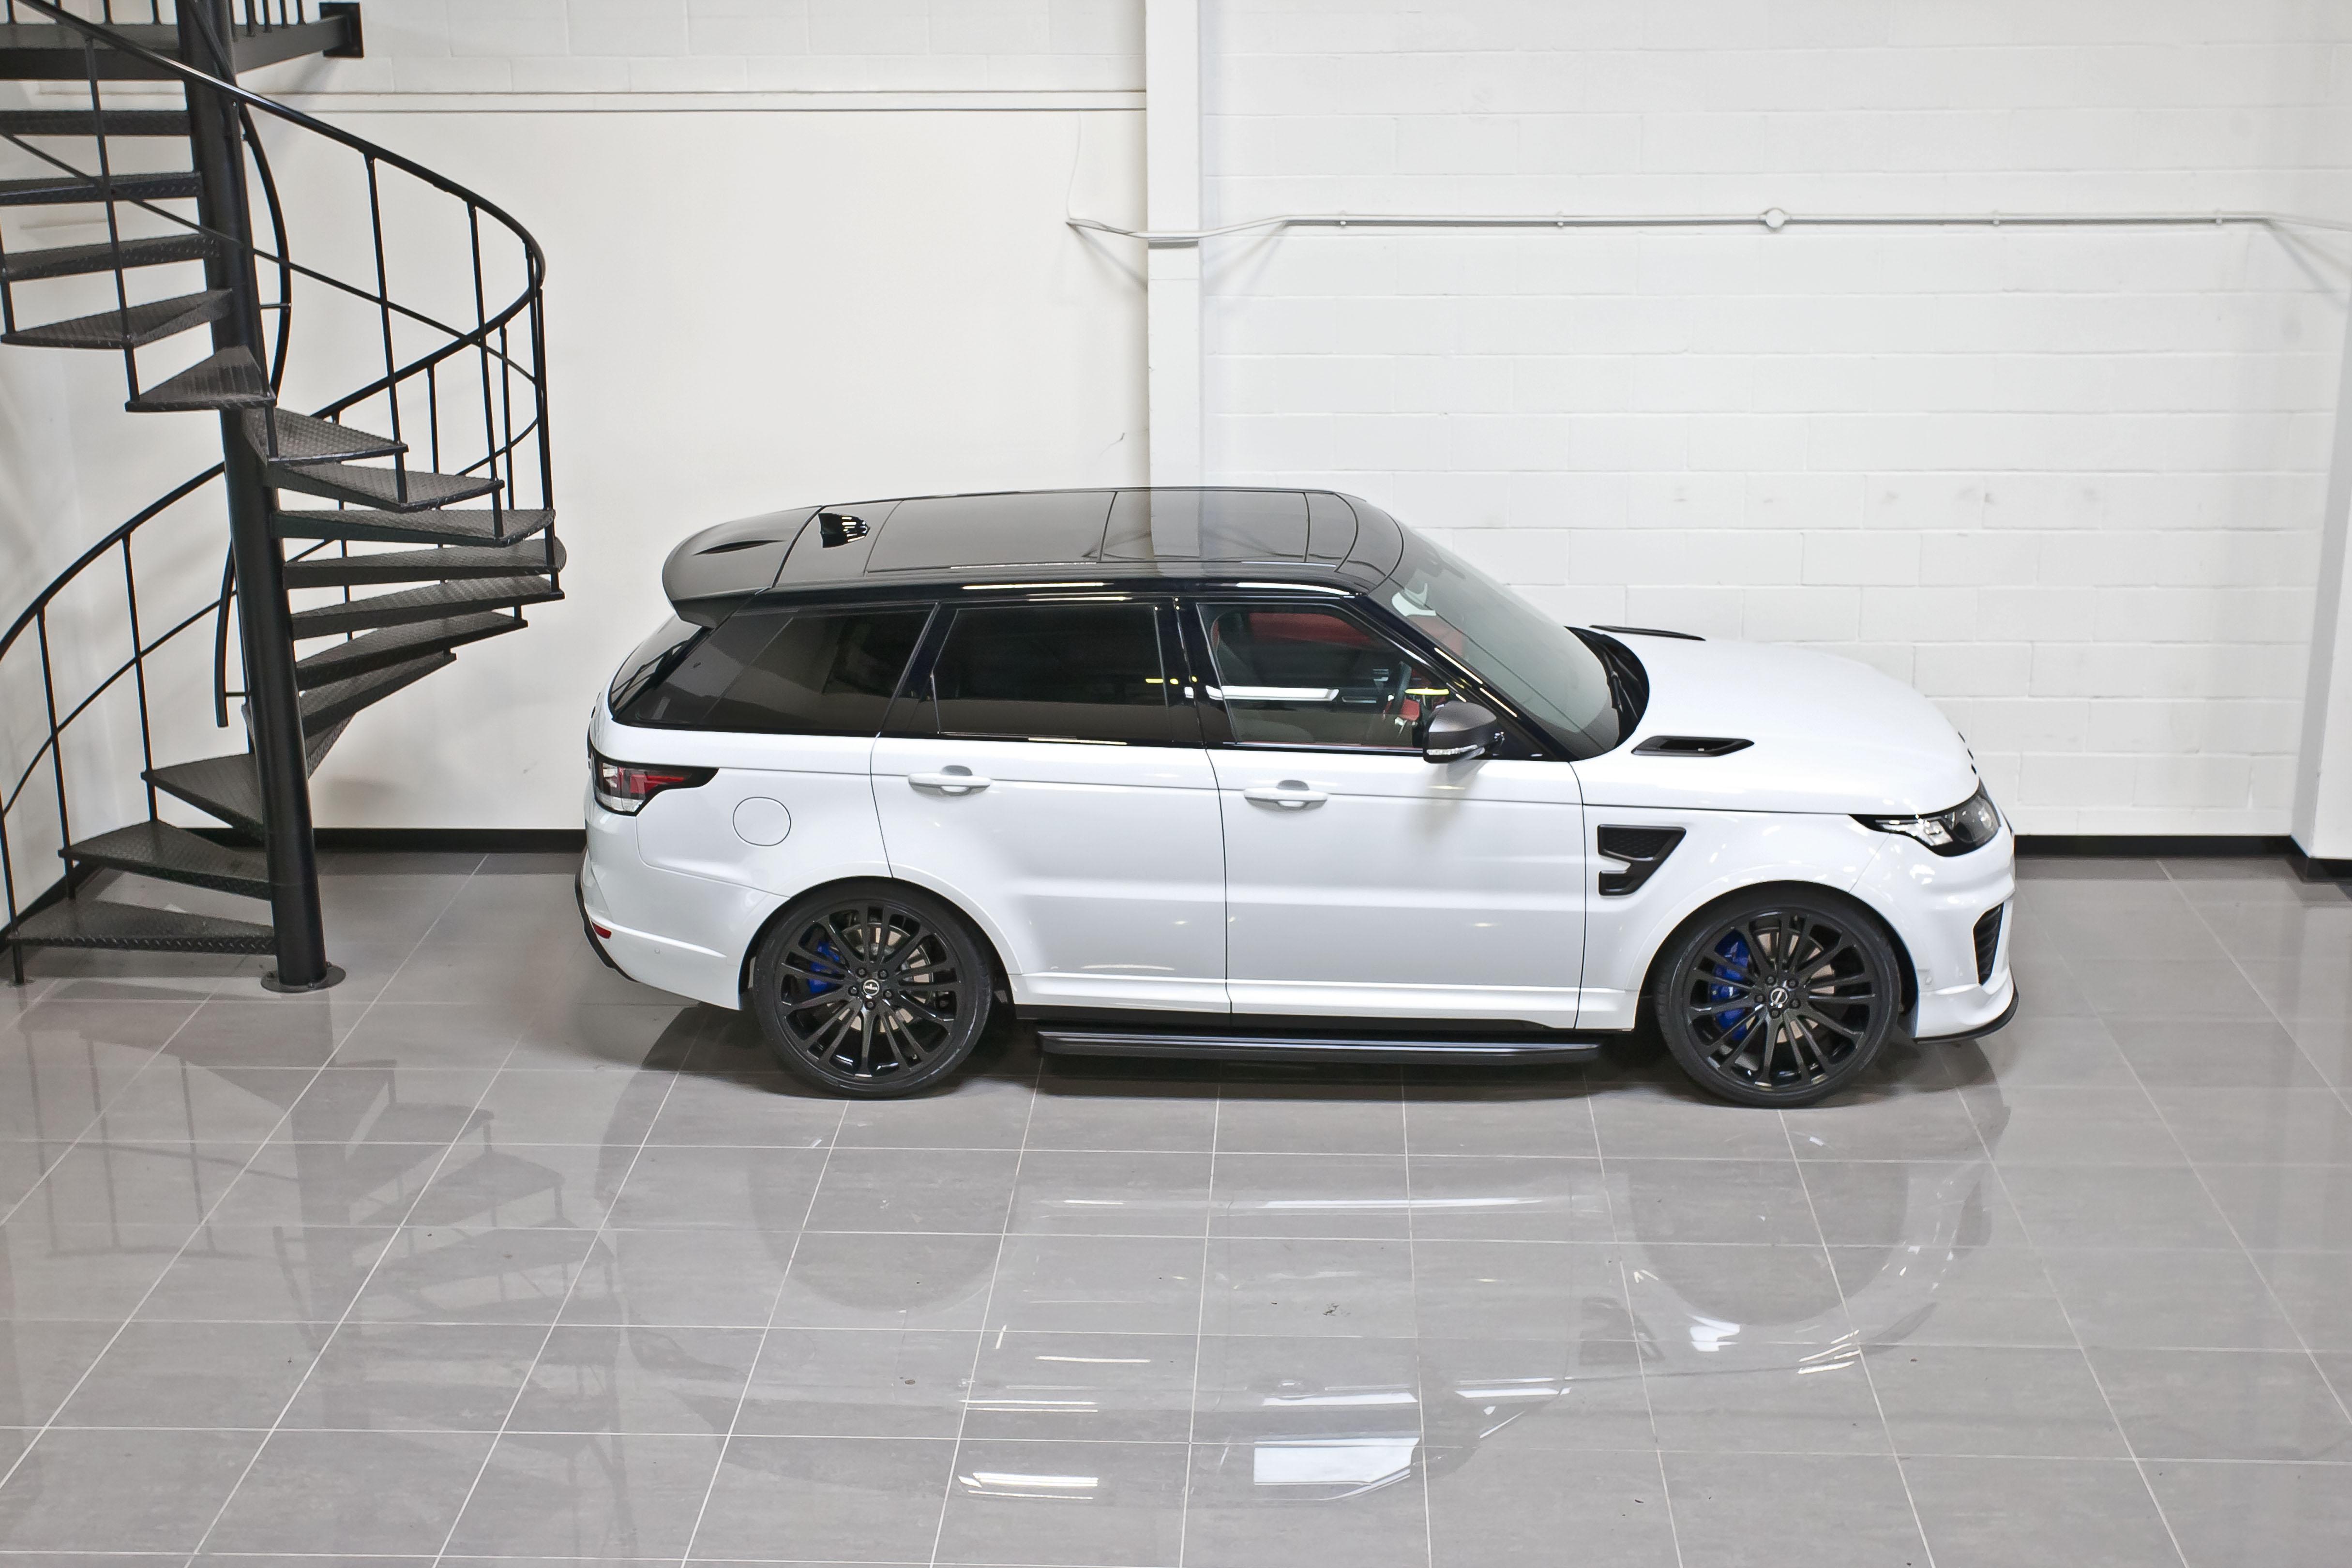 Range Rover SVR Yulong Matte Carbon29